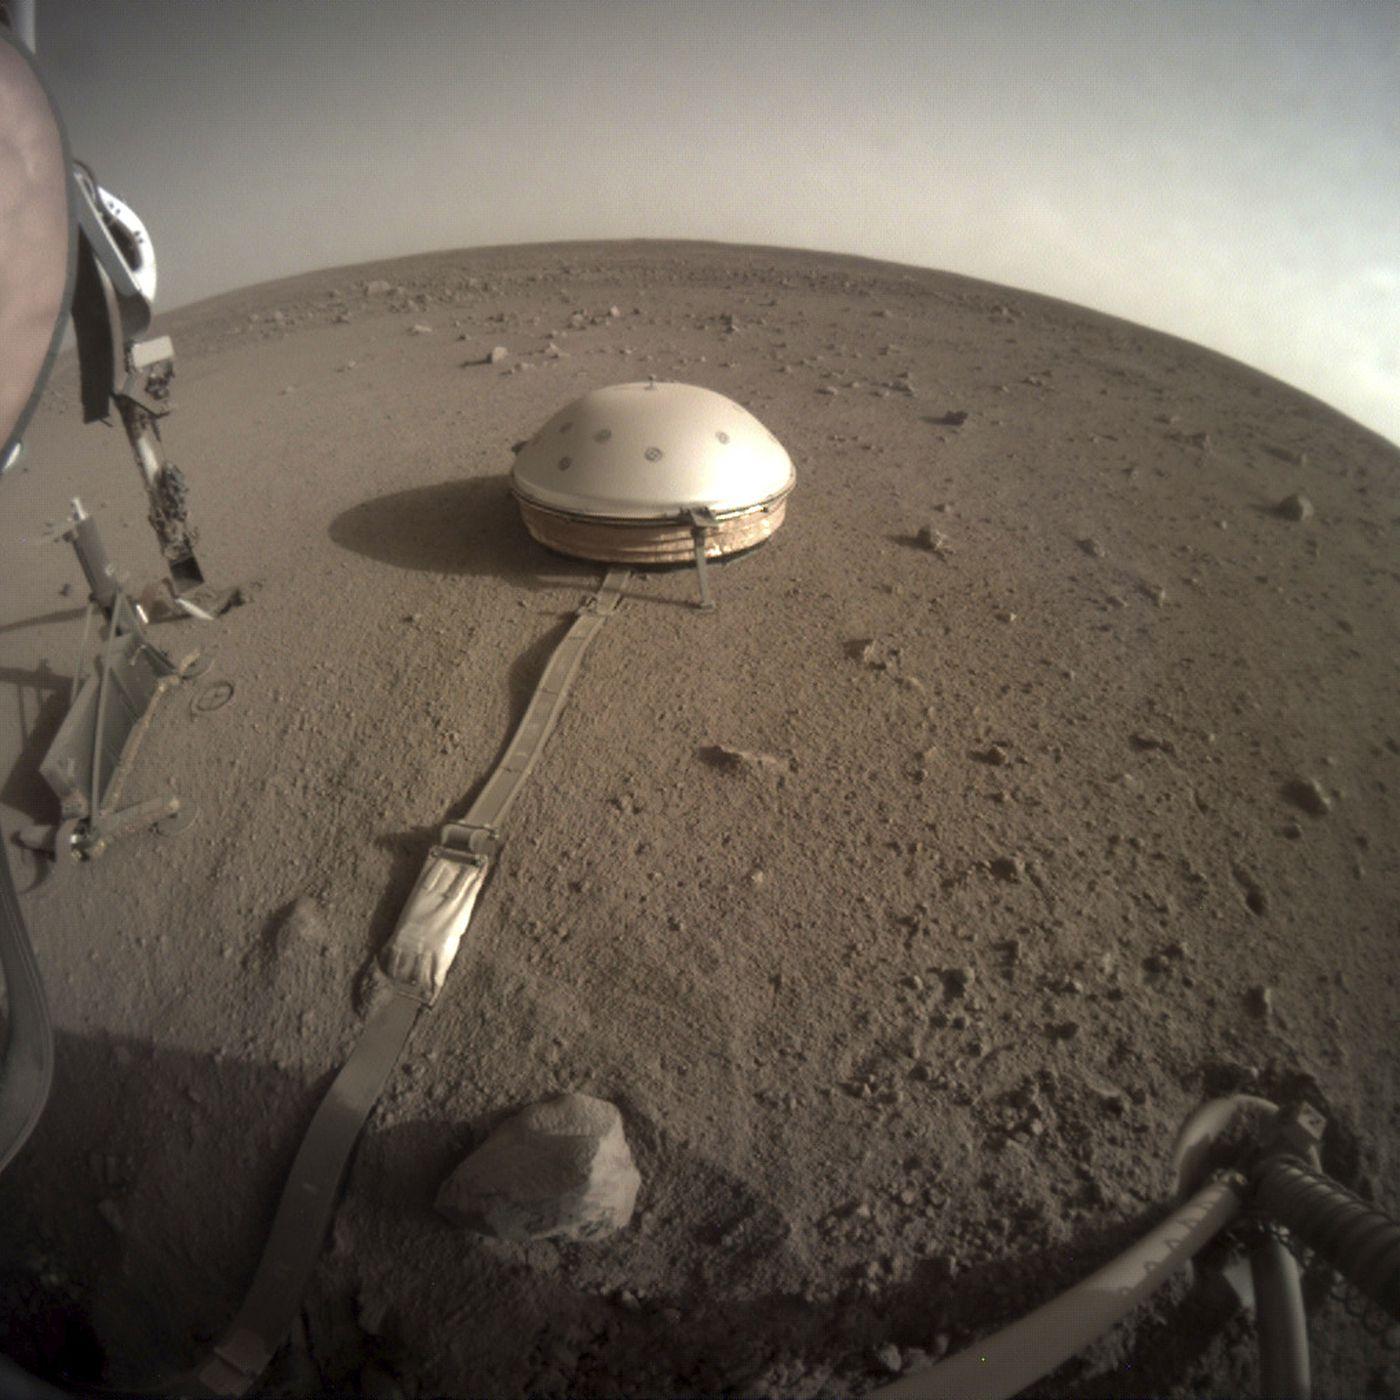 deseret.com - Nate Schwartz - Why NASA's Mars InSight lander is at risk of dying